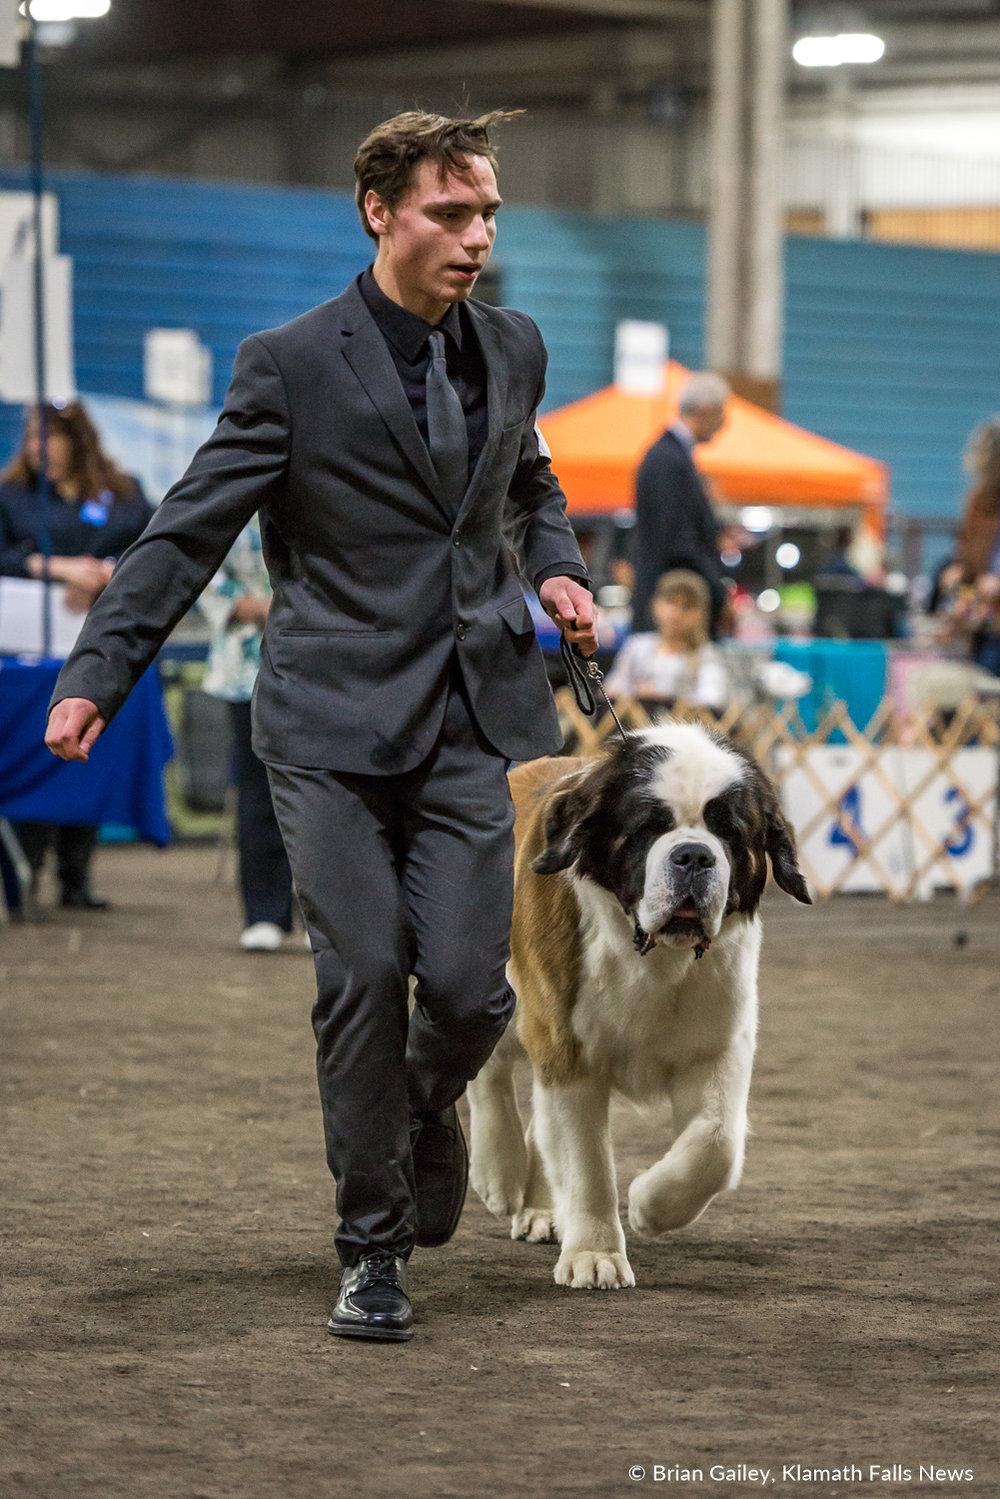 Klamath Dog Show. May 11, 2018 (Brian Gailey)